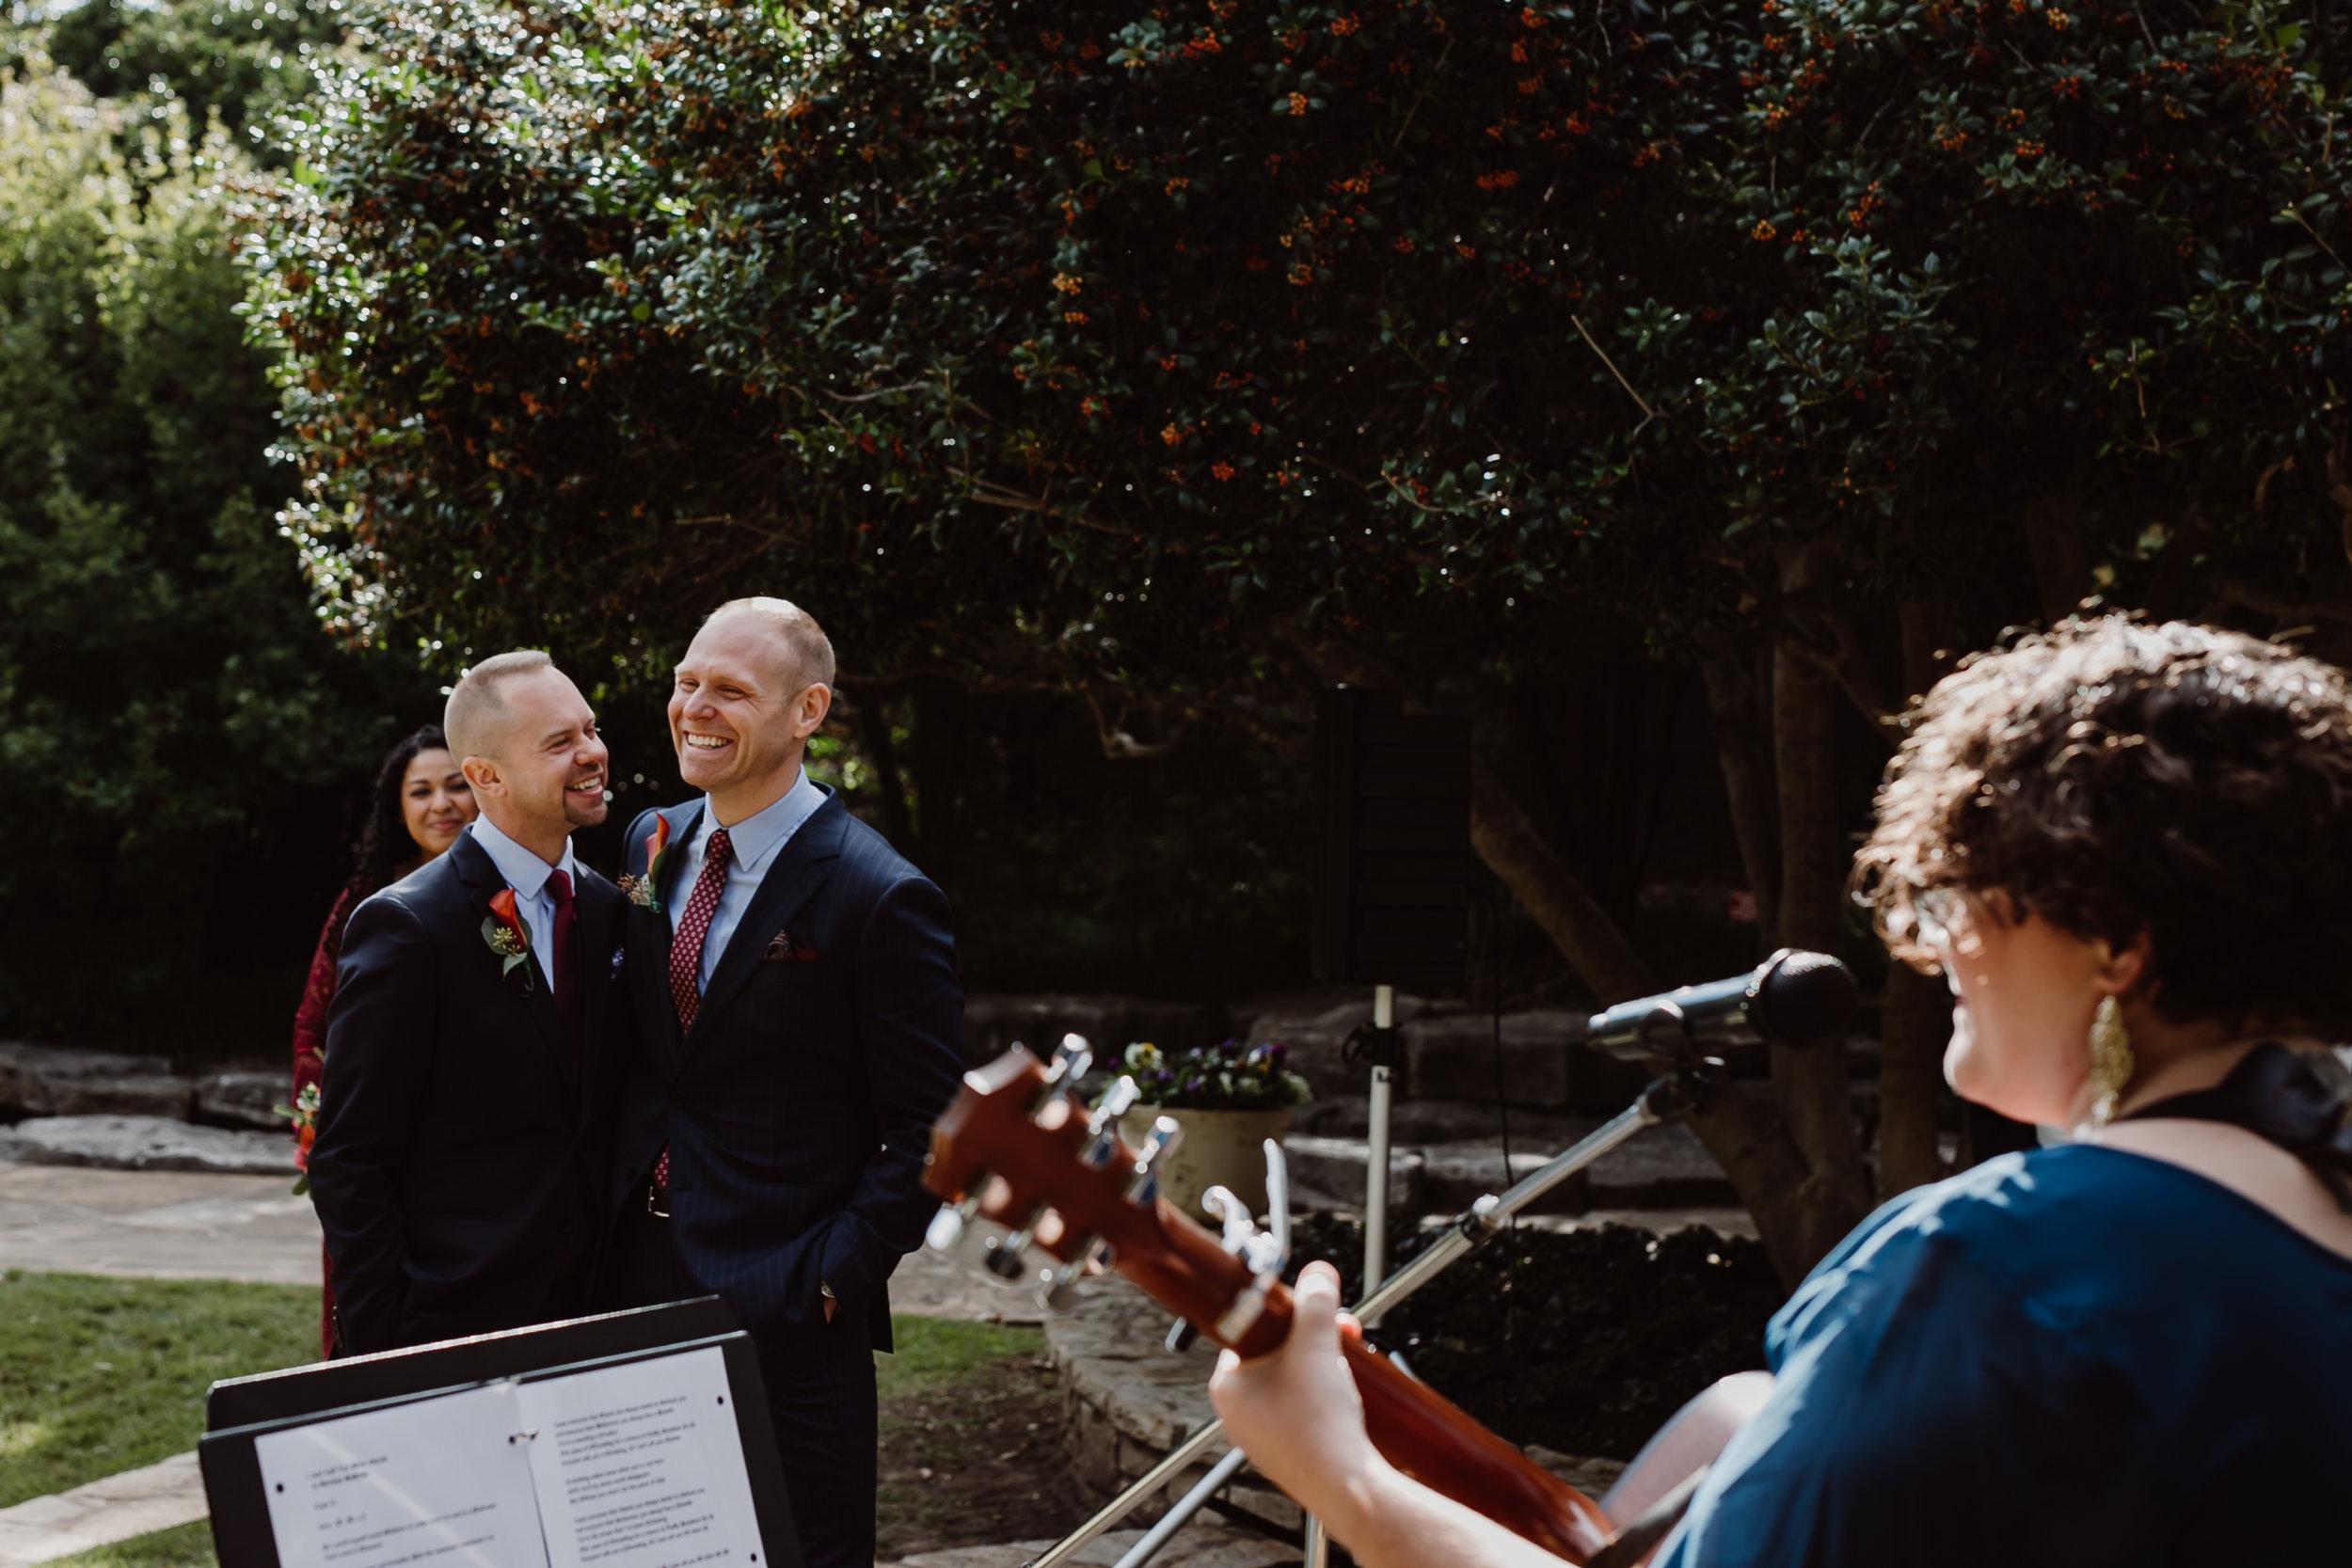 ftworth-botanical-gardens-wedding-M&T (348 of 548).jpg